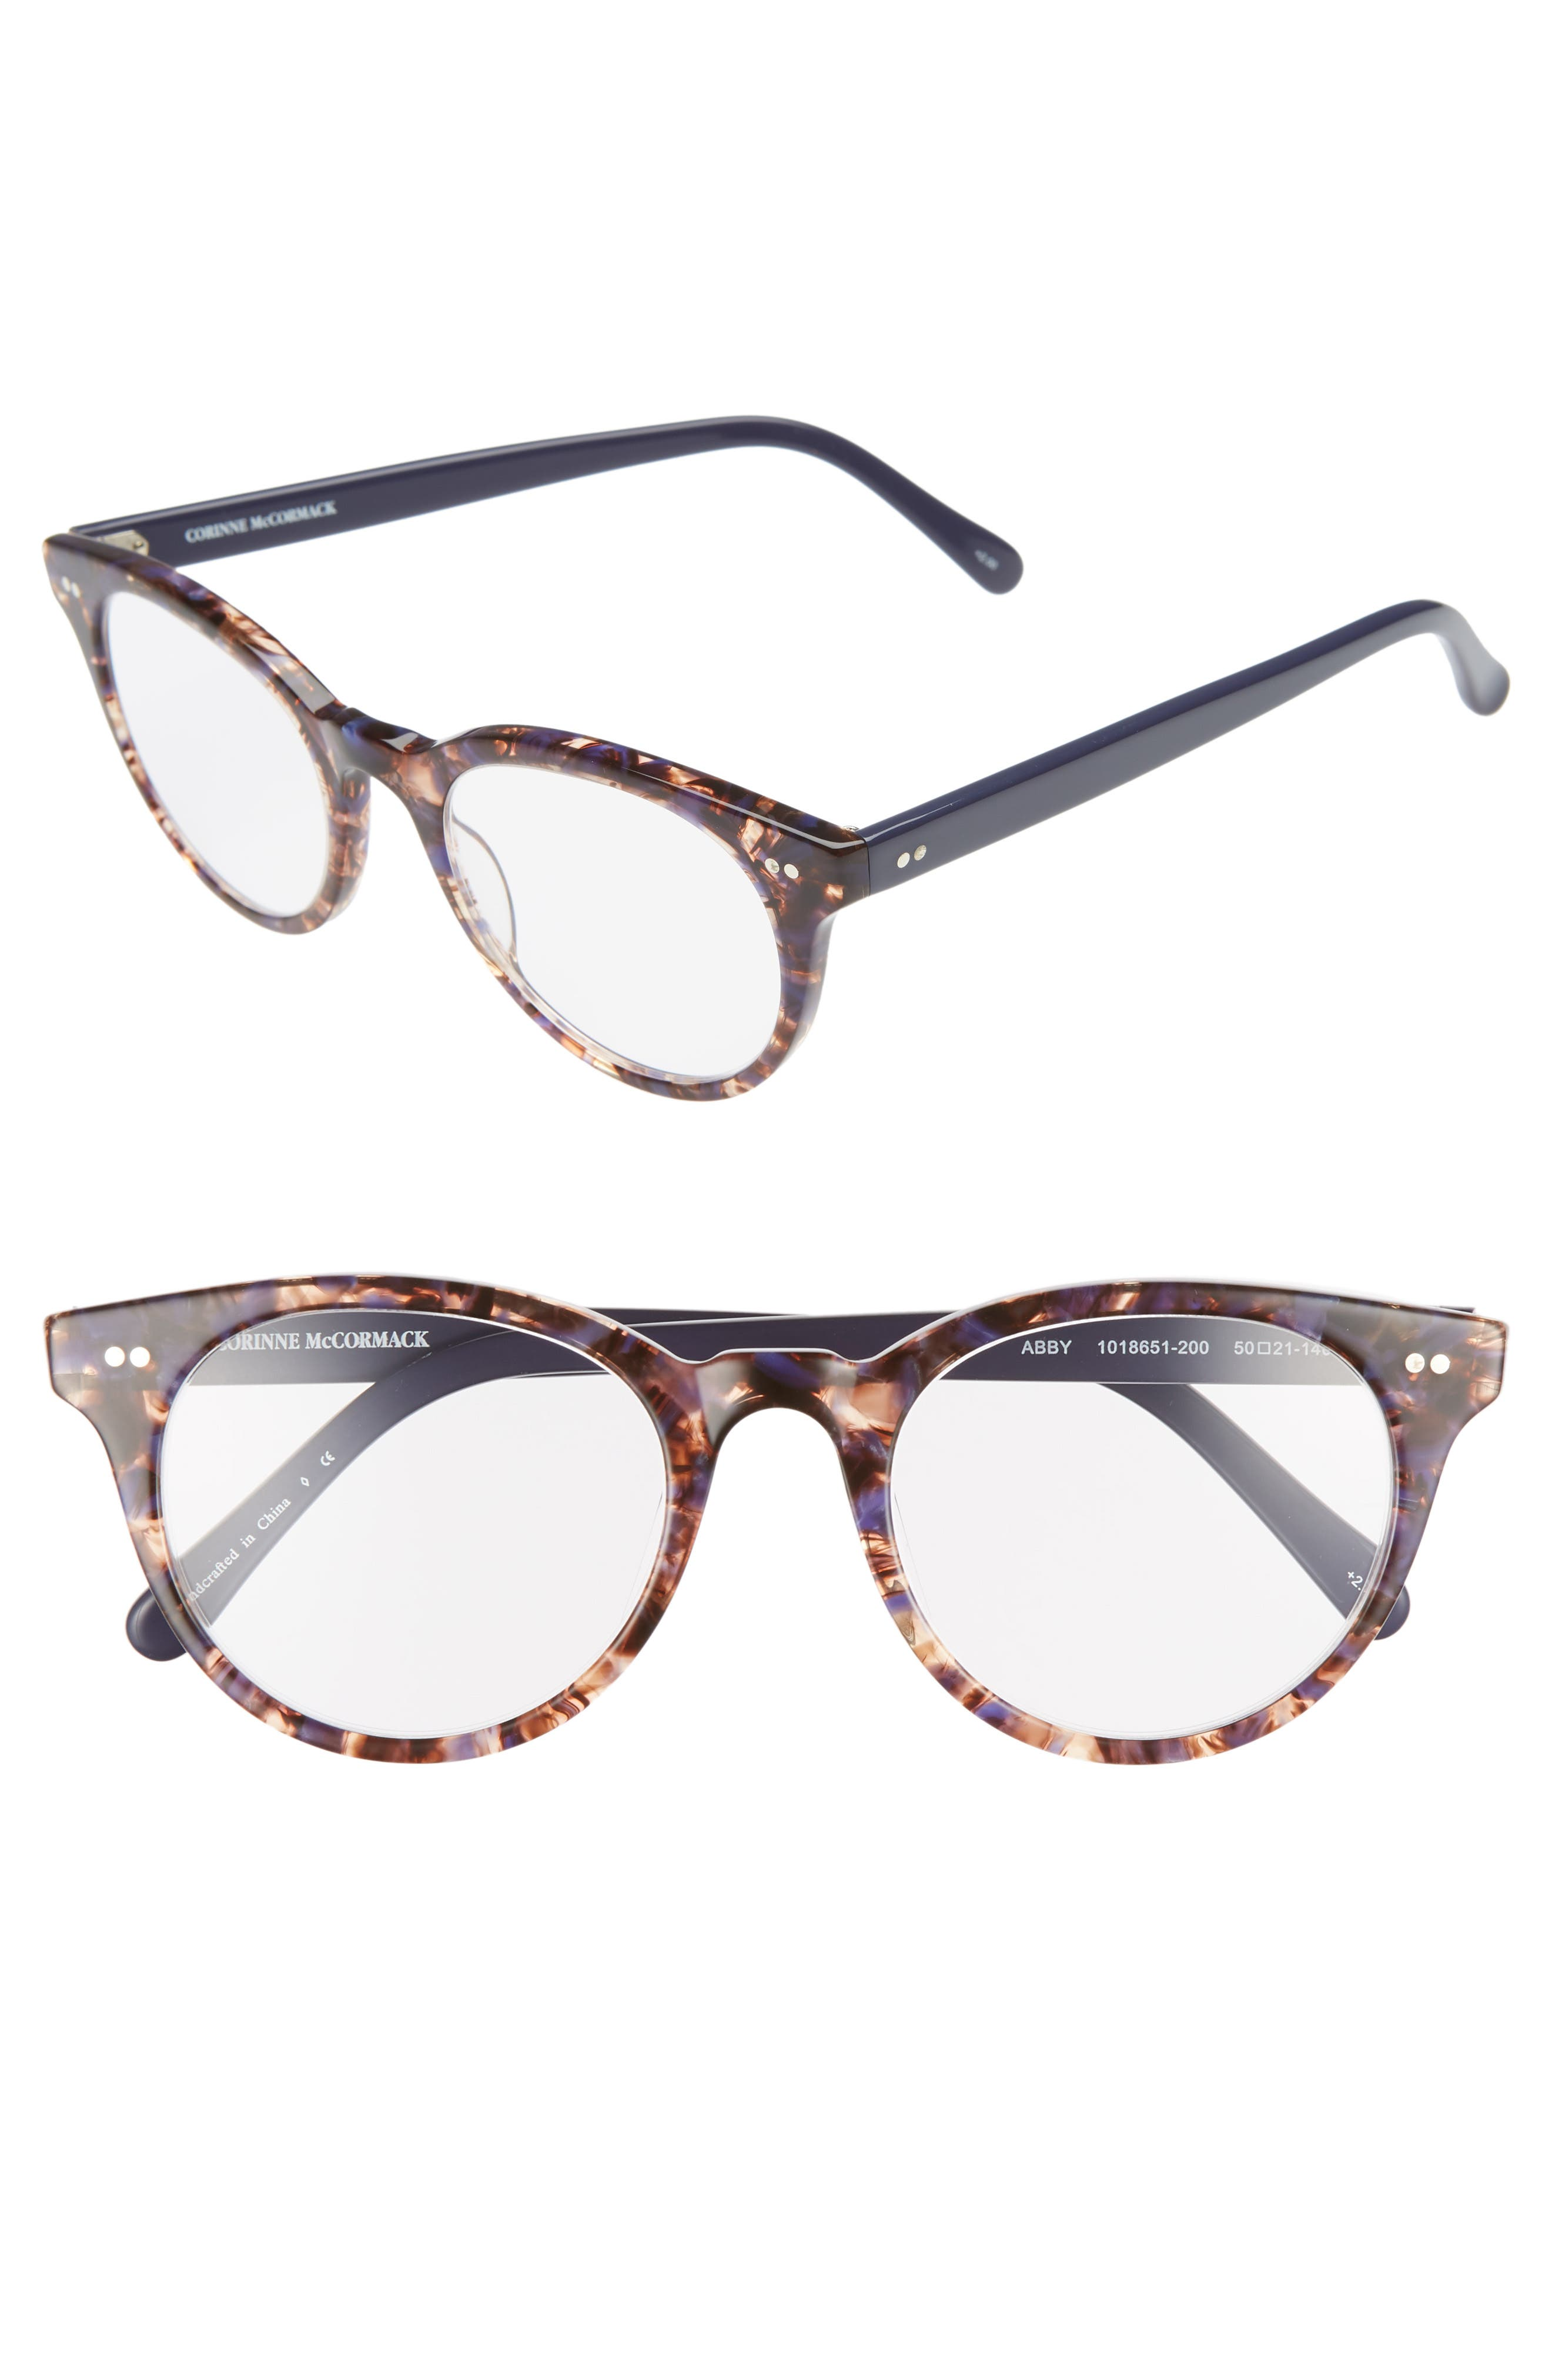 Abby 50mm Reading Glasses,                         Main,                         color, TORTOISE/ NAVY BLUE